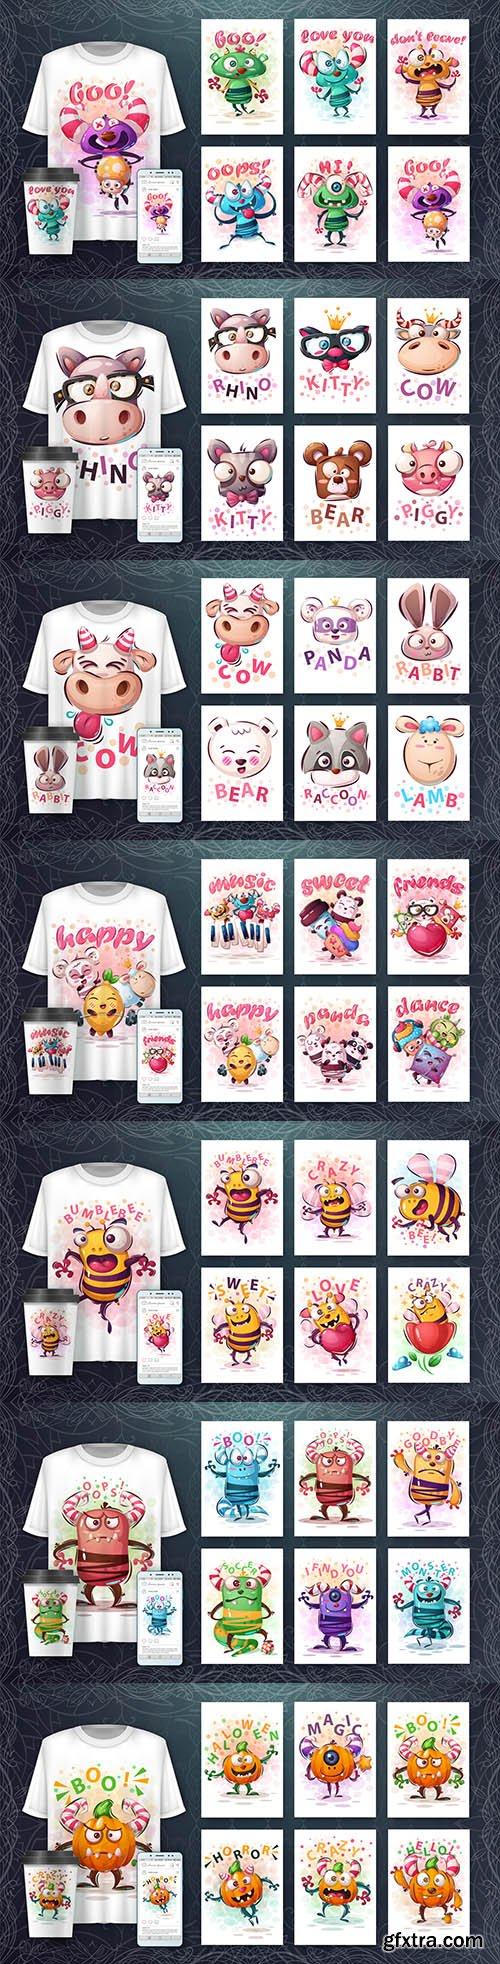 Funny illustration and merchandising mockup print t-shirt 4